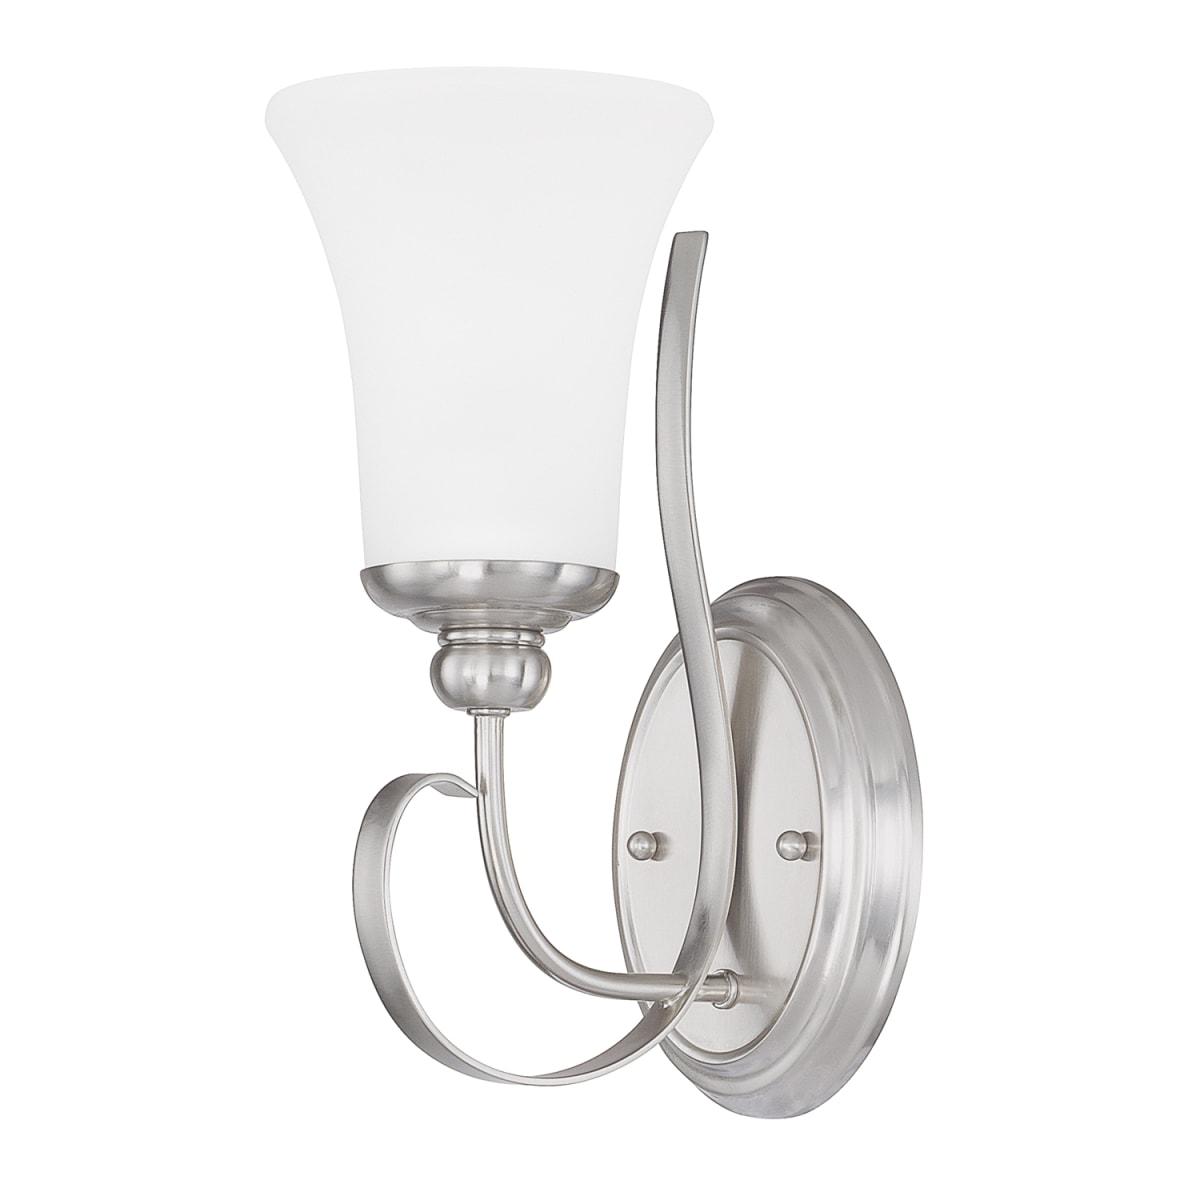 Capital Lighting 614511bn 335 Brushed Nickel Griffin Single Light Bathroom Sconce